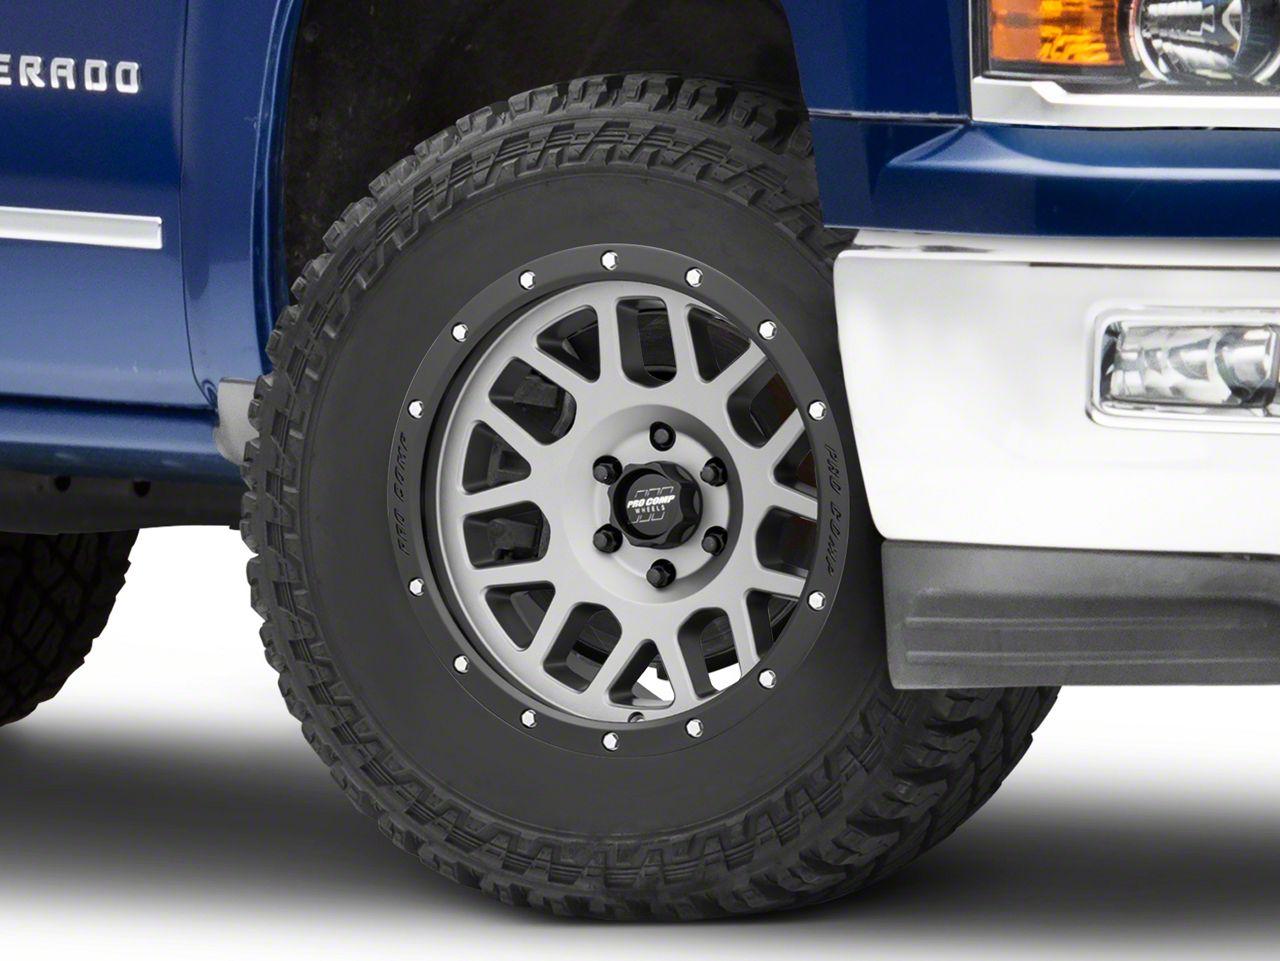 Pro Comp Vertigo Matte Graphite 6-Lug Wheel - 18x9 (99-18 Silverado 1500)